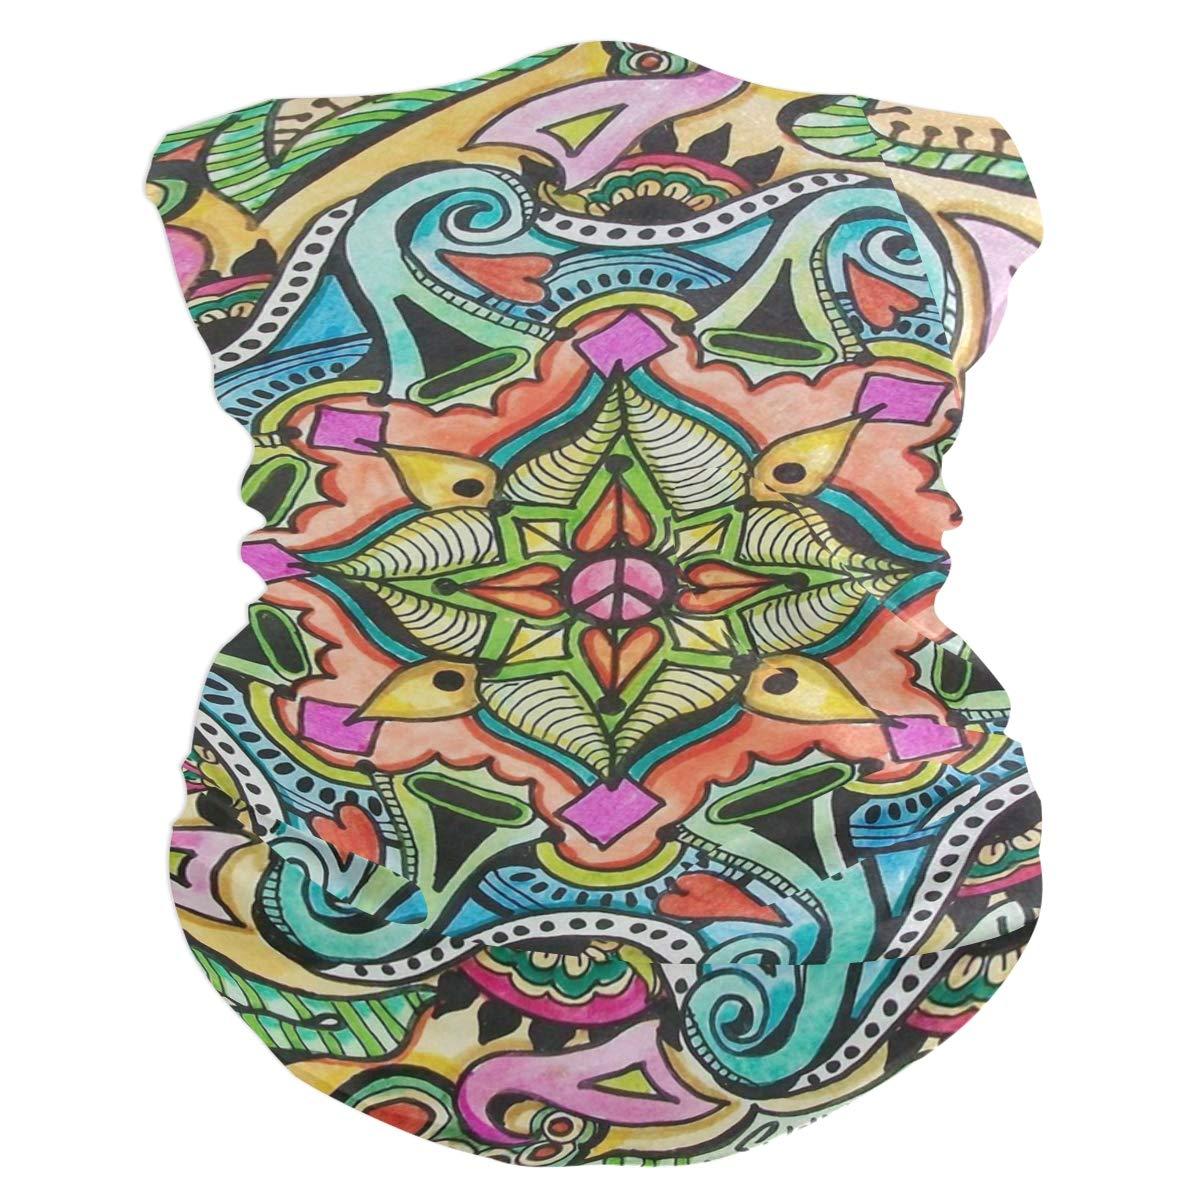 Hippie Love Bavaclava Face Mask for Women Bandana Neck Gaiter Half Face Masks Cold Weather Men kids